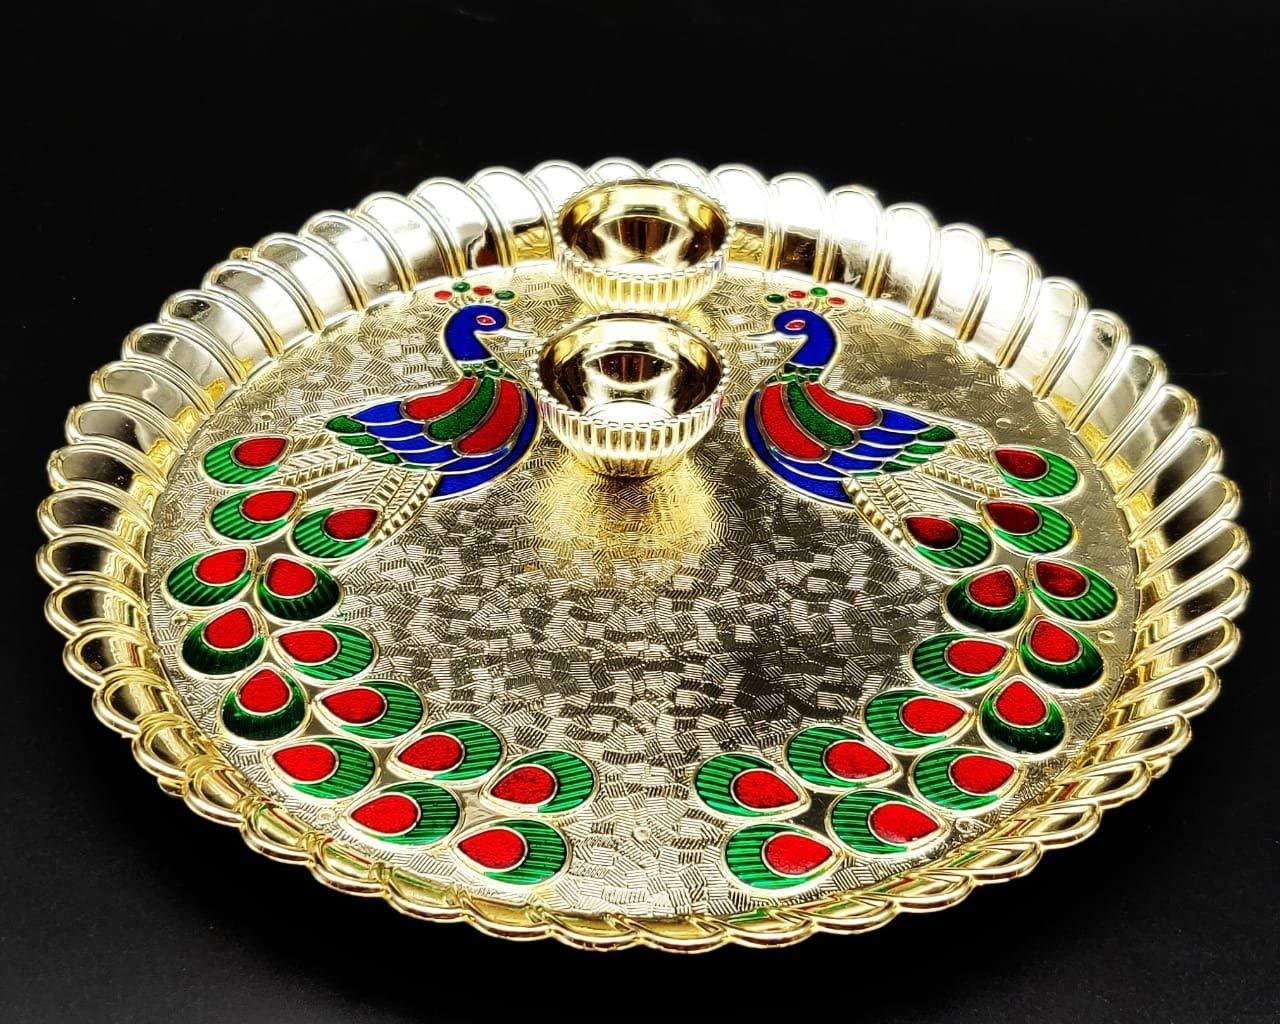 Thali 1 Pooja Thali Decorative Platter Set for Karwachauth Puja//Pooja Diwali//Deepawali Laxmi,Durga,Ganesh Pooja for Hindu Puja Designer Art Pooja Thali//Puja Thali